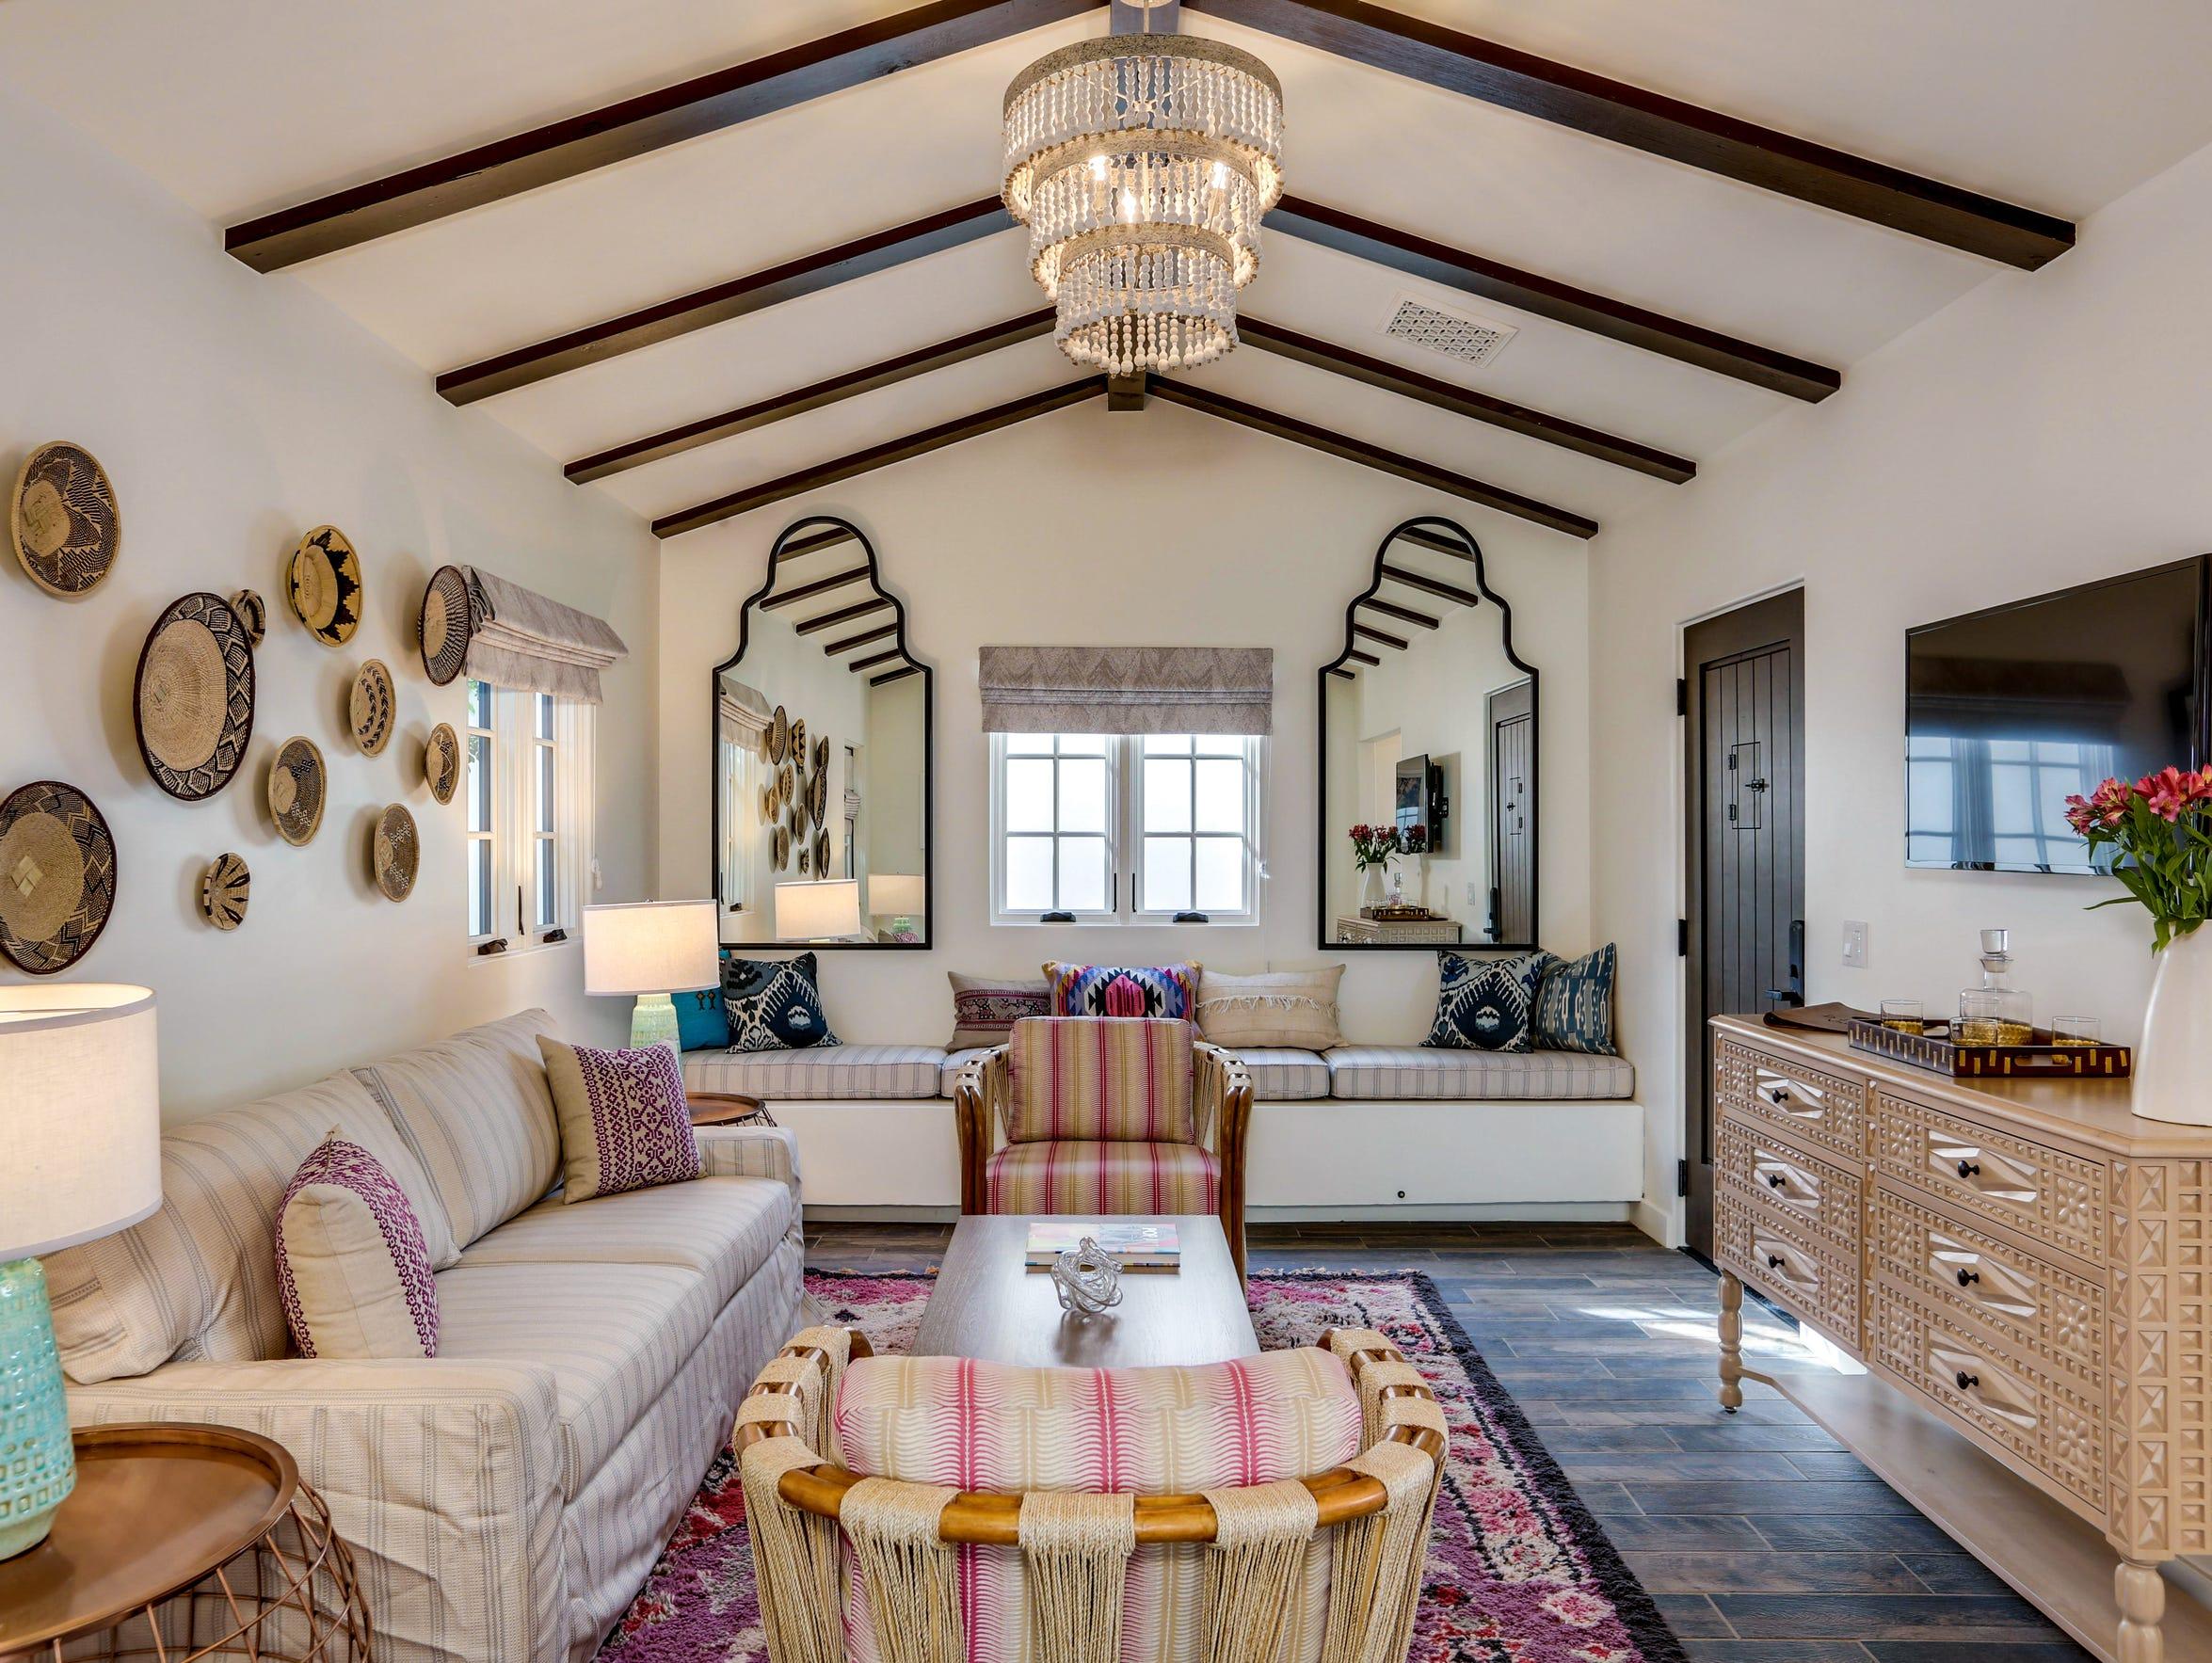 This La Serena Villas living room makes us want to